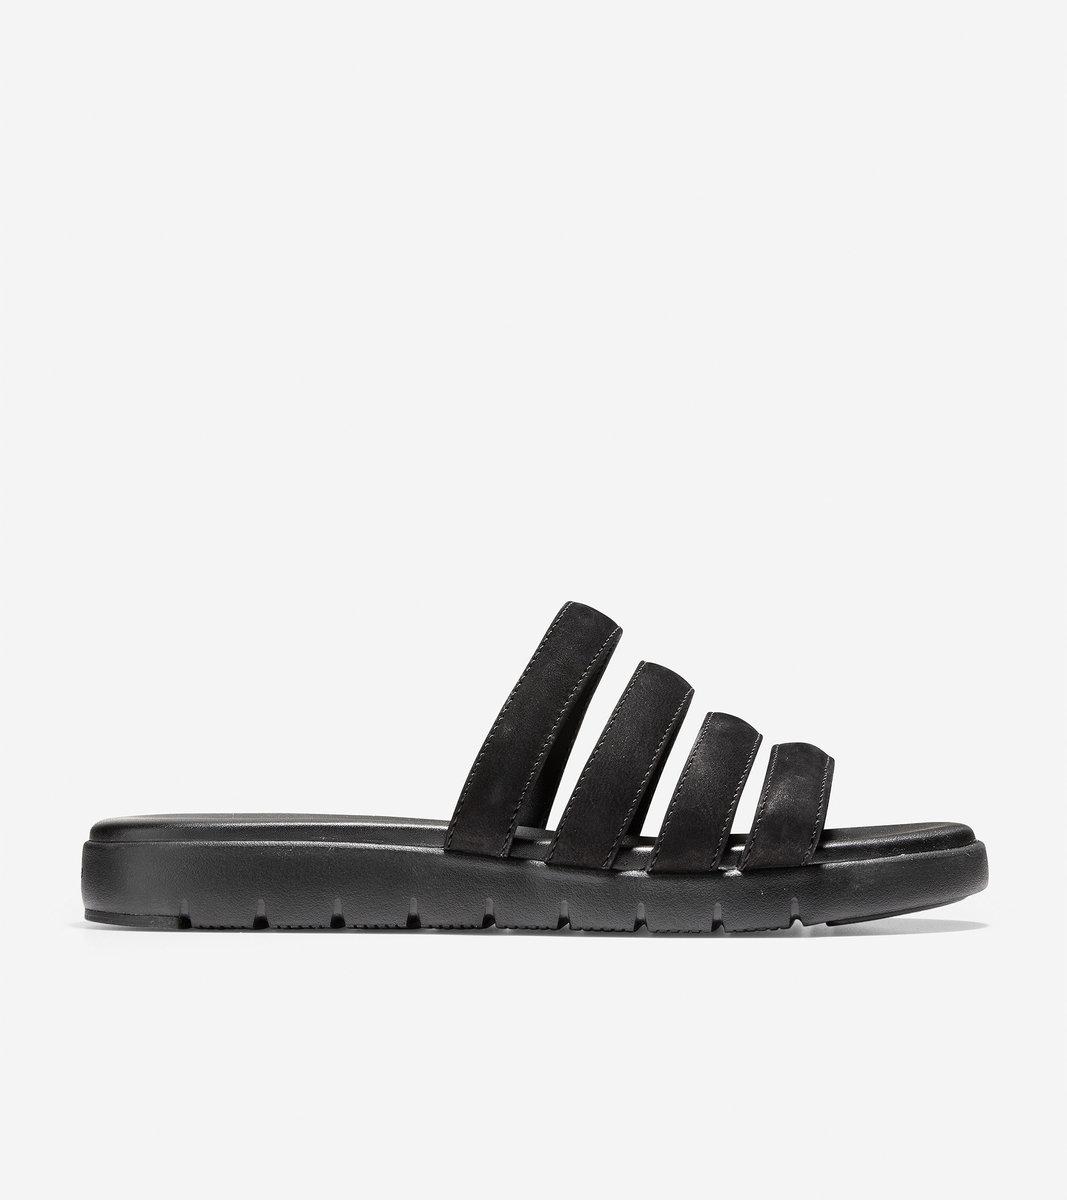 Women's ZERØGRAND Multi Strap Sandal(Black Leather) US 5